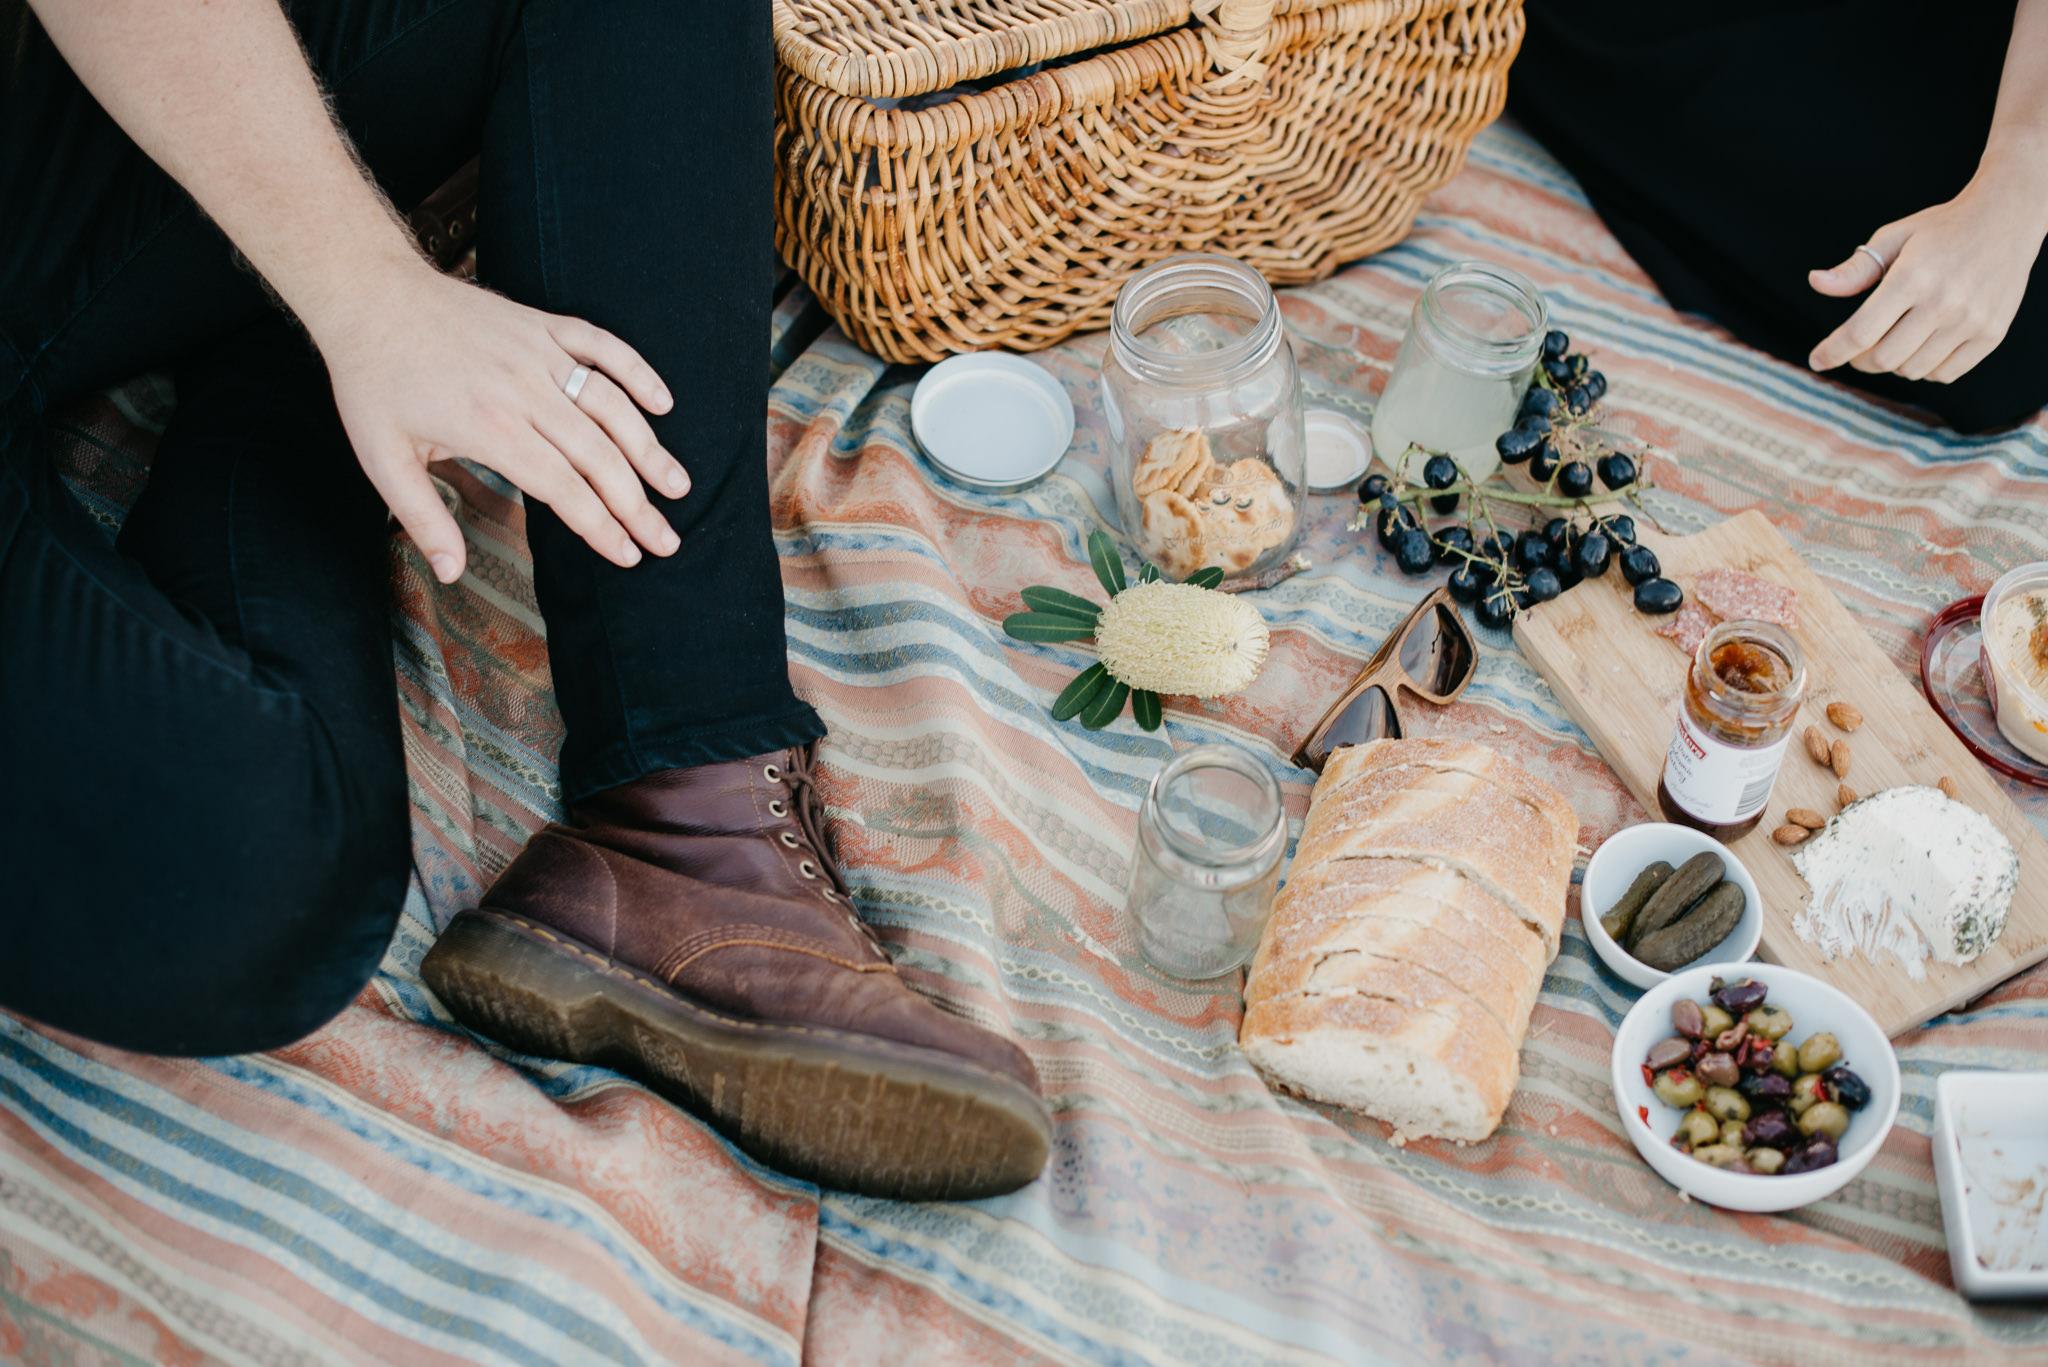 180408 - noosa picnic-11.jpg